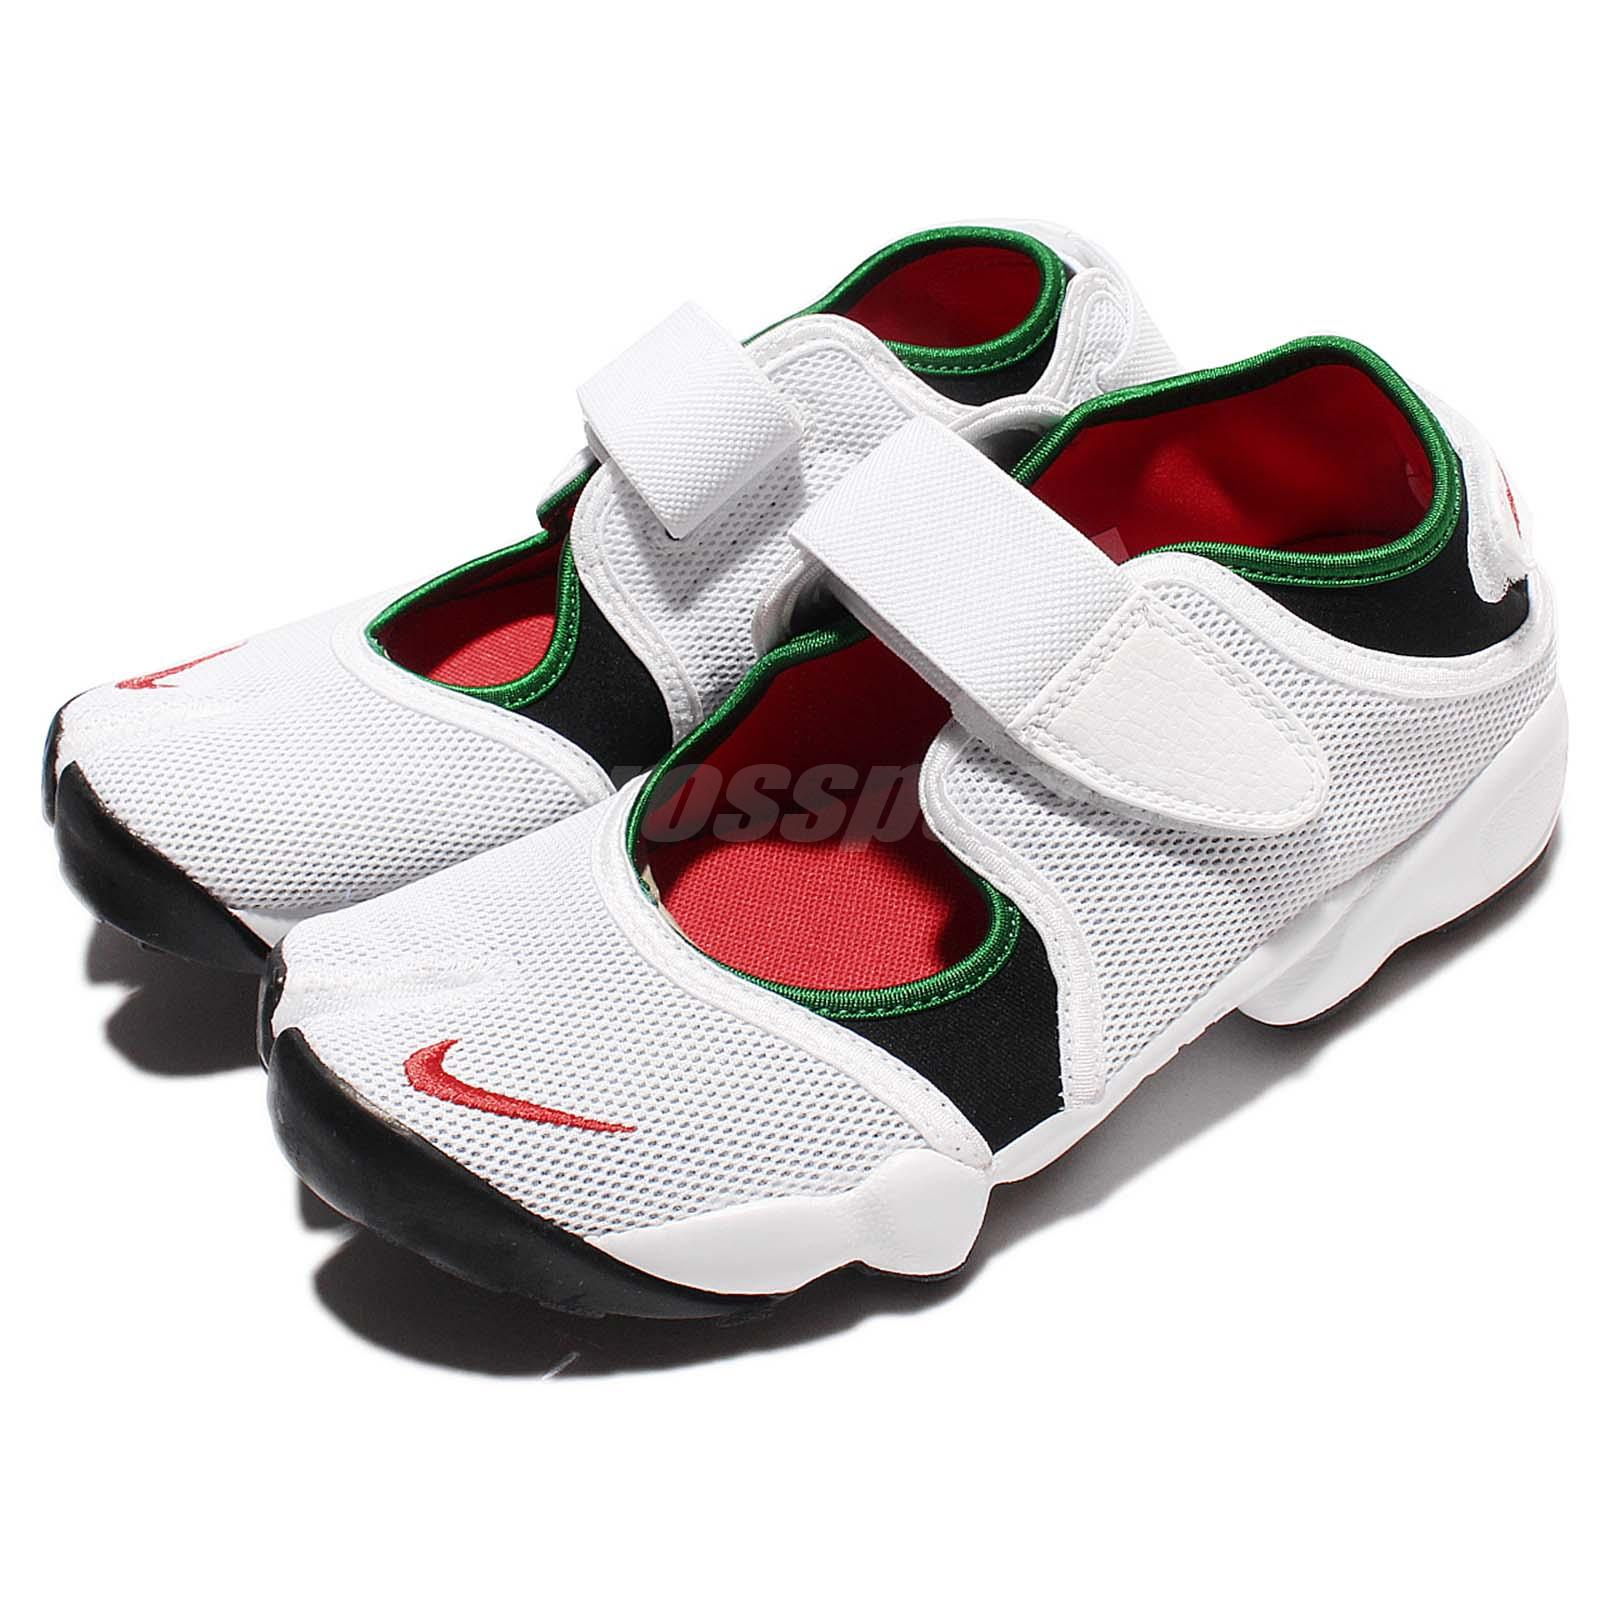 3def5680d12c0f slip on nike sneakers womens wide sandals shoes Free shipping BOTH ways on nike  shox nz black dark grey pink blast ...